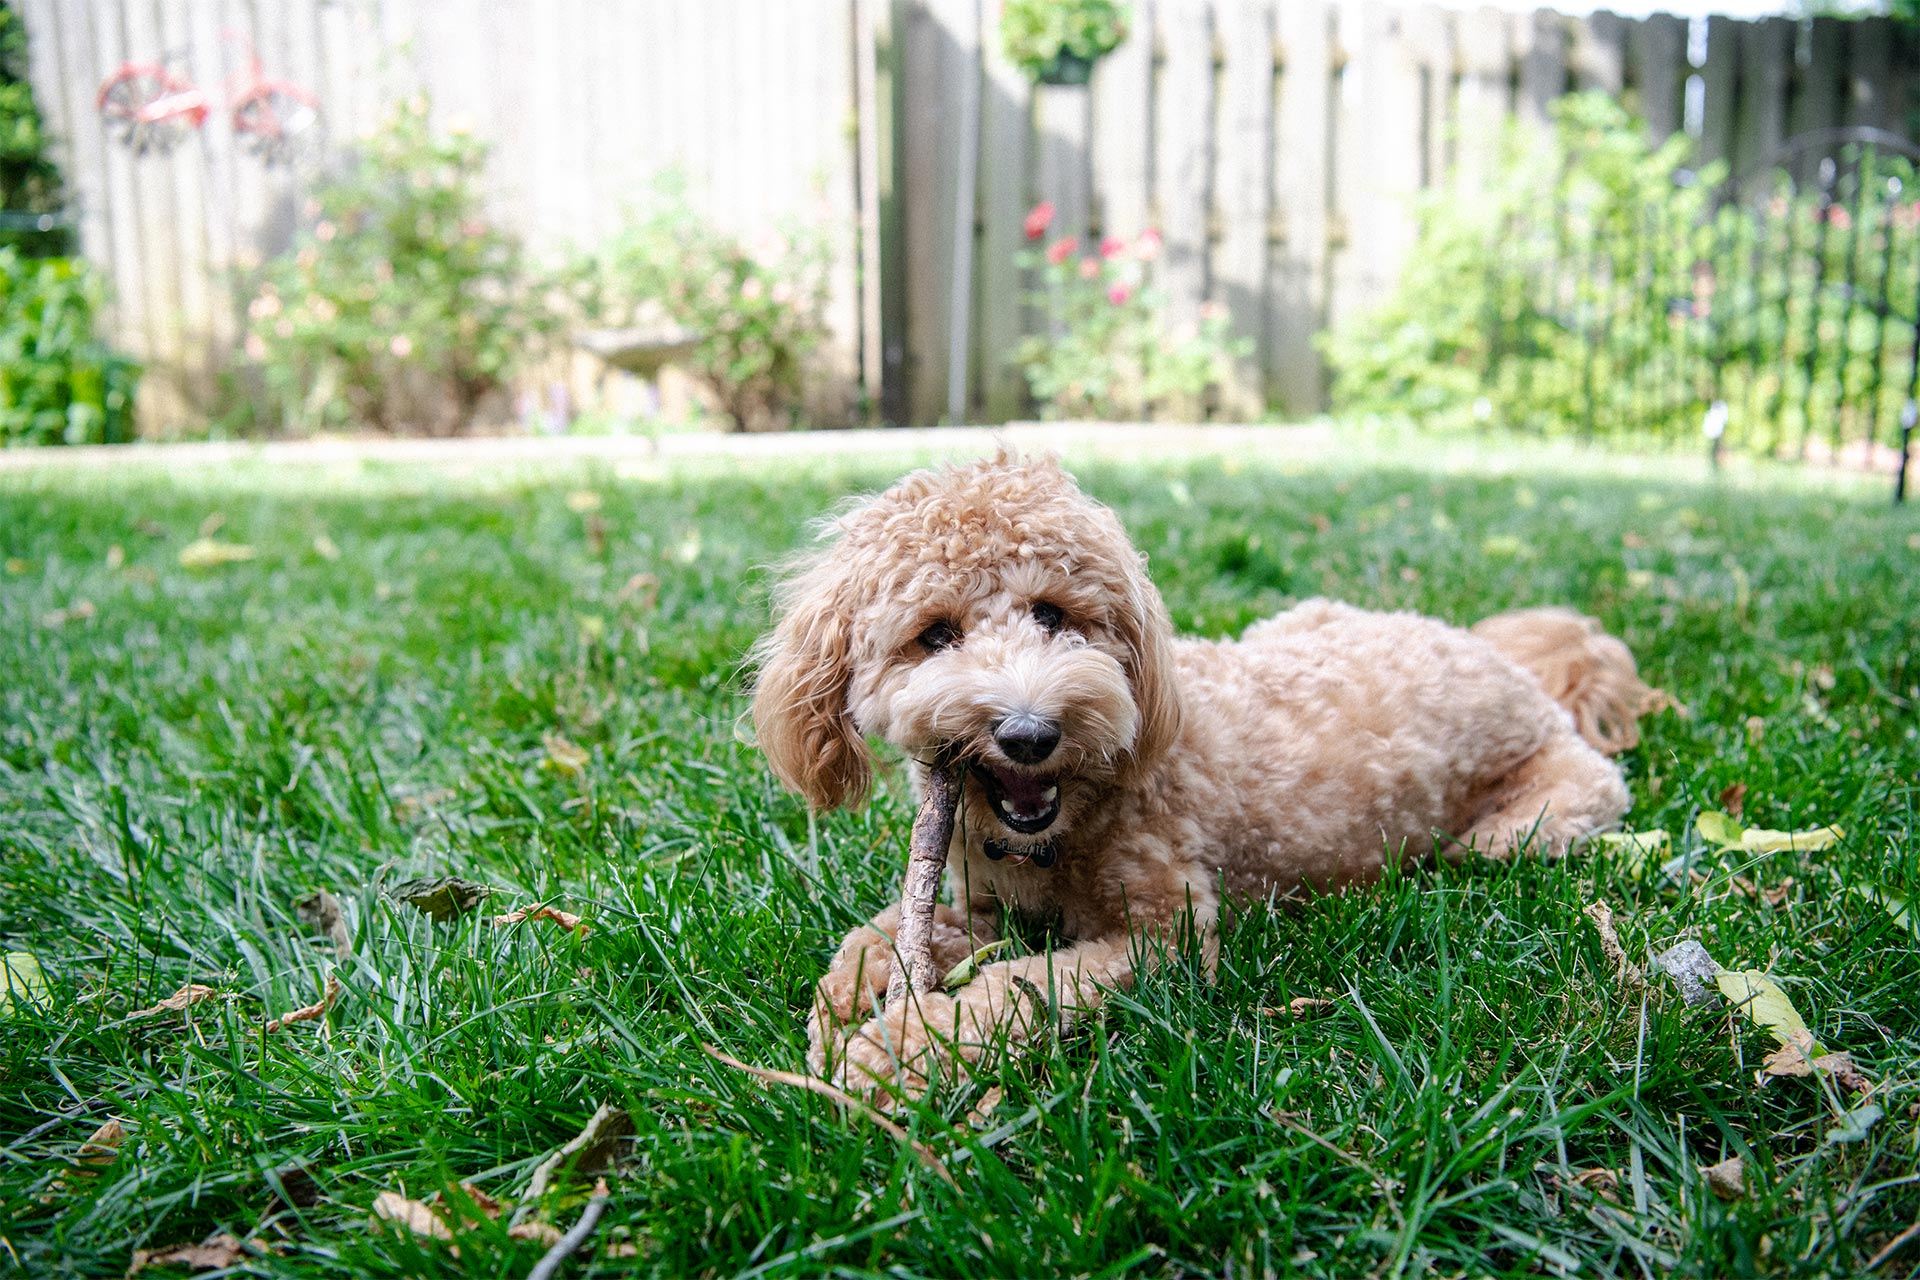 Suzanne's dog, Teddy, chews a stick in her yard.